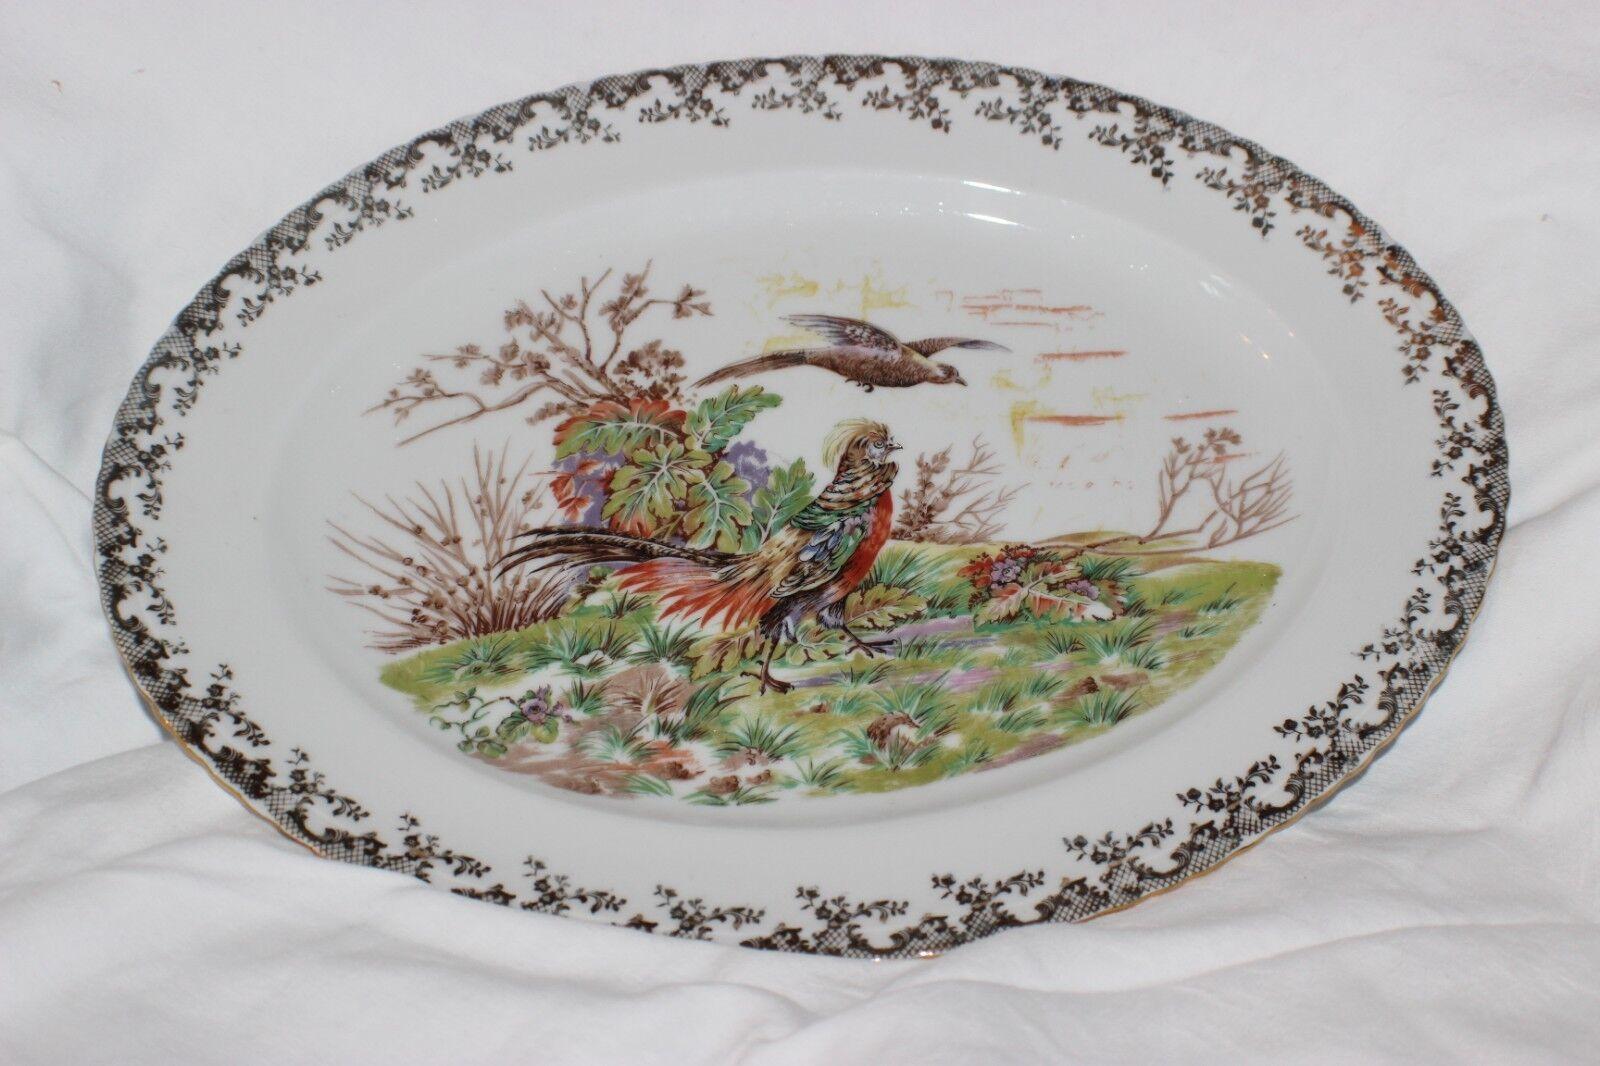 LIMOGES FRANCE 1 X Grand Ovale Faifan Plateau Platter Oval Pheasant Flying